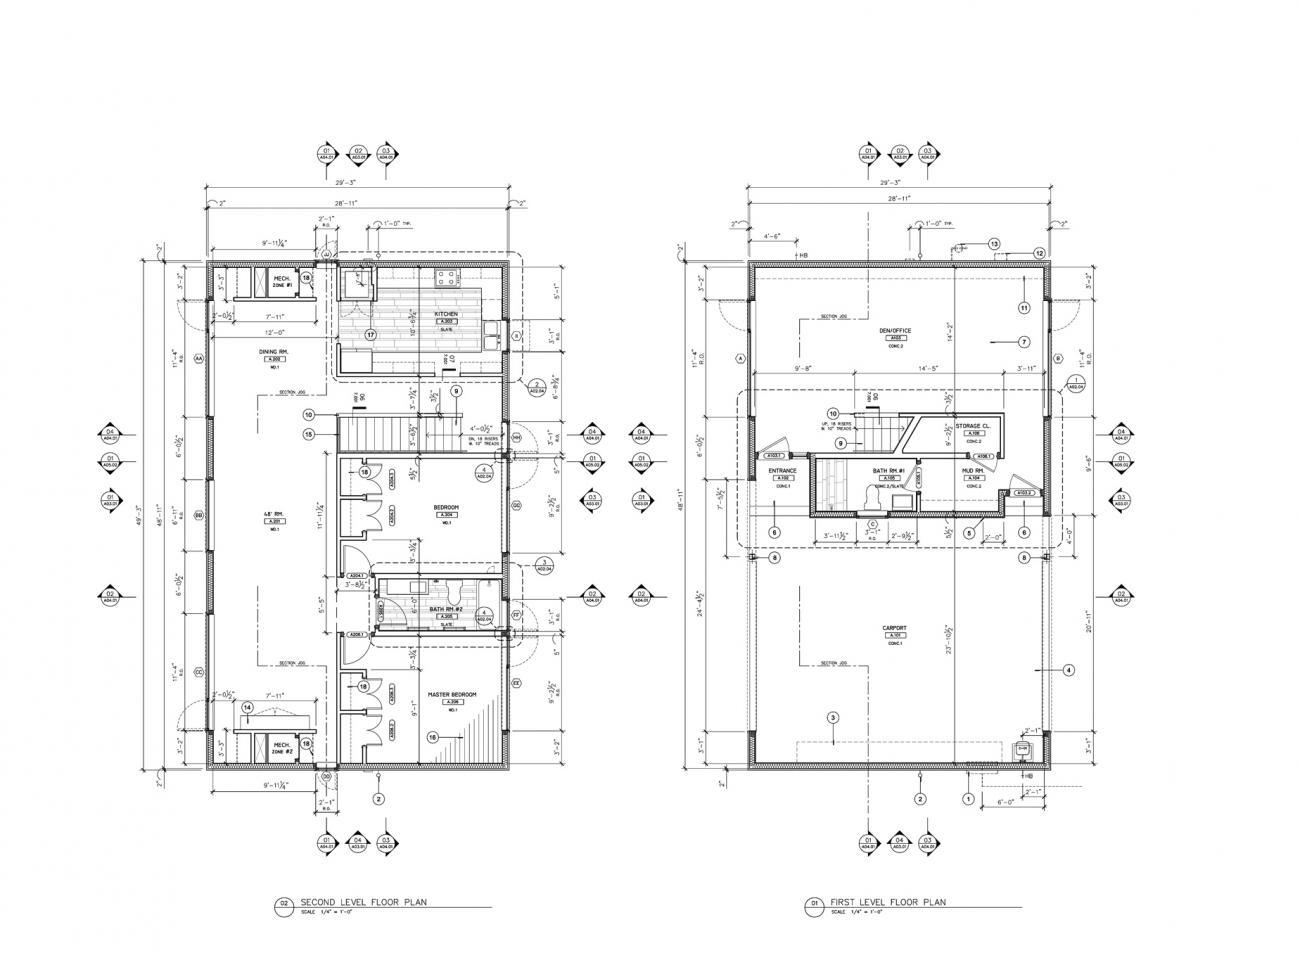 Plan drawings